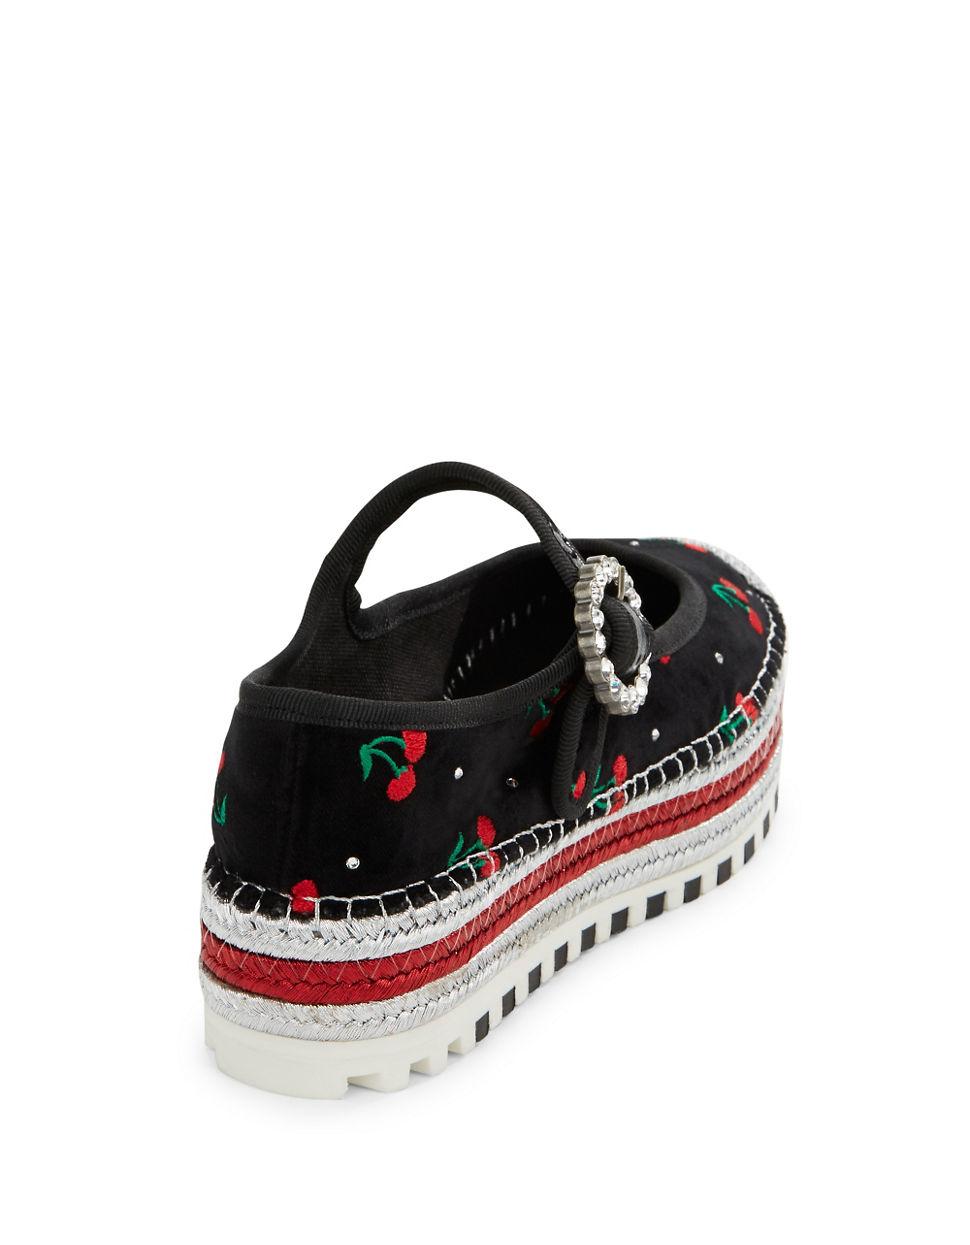 d8e163daa25 Marc Jacobs Suzi Cherry Espadrille Platforms in Black - Lyst